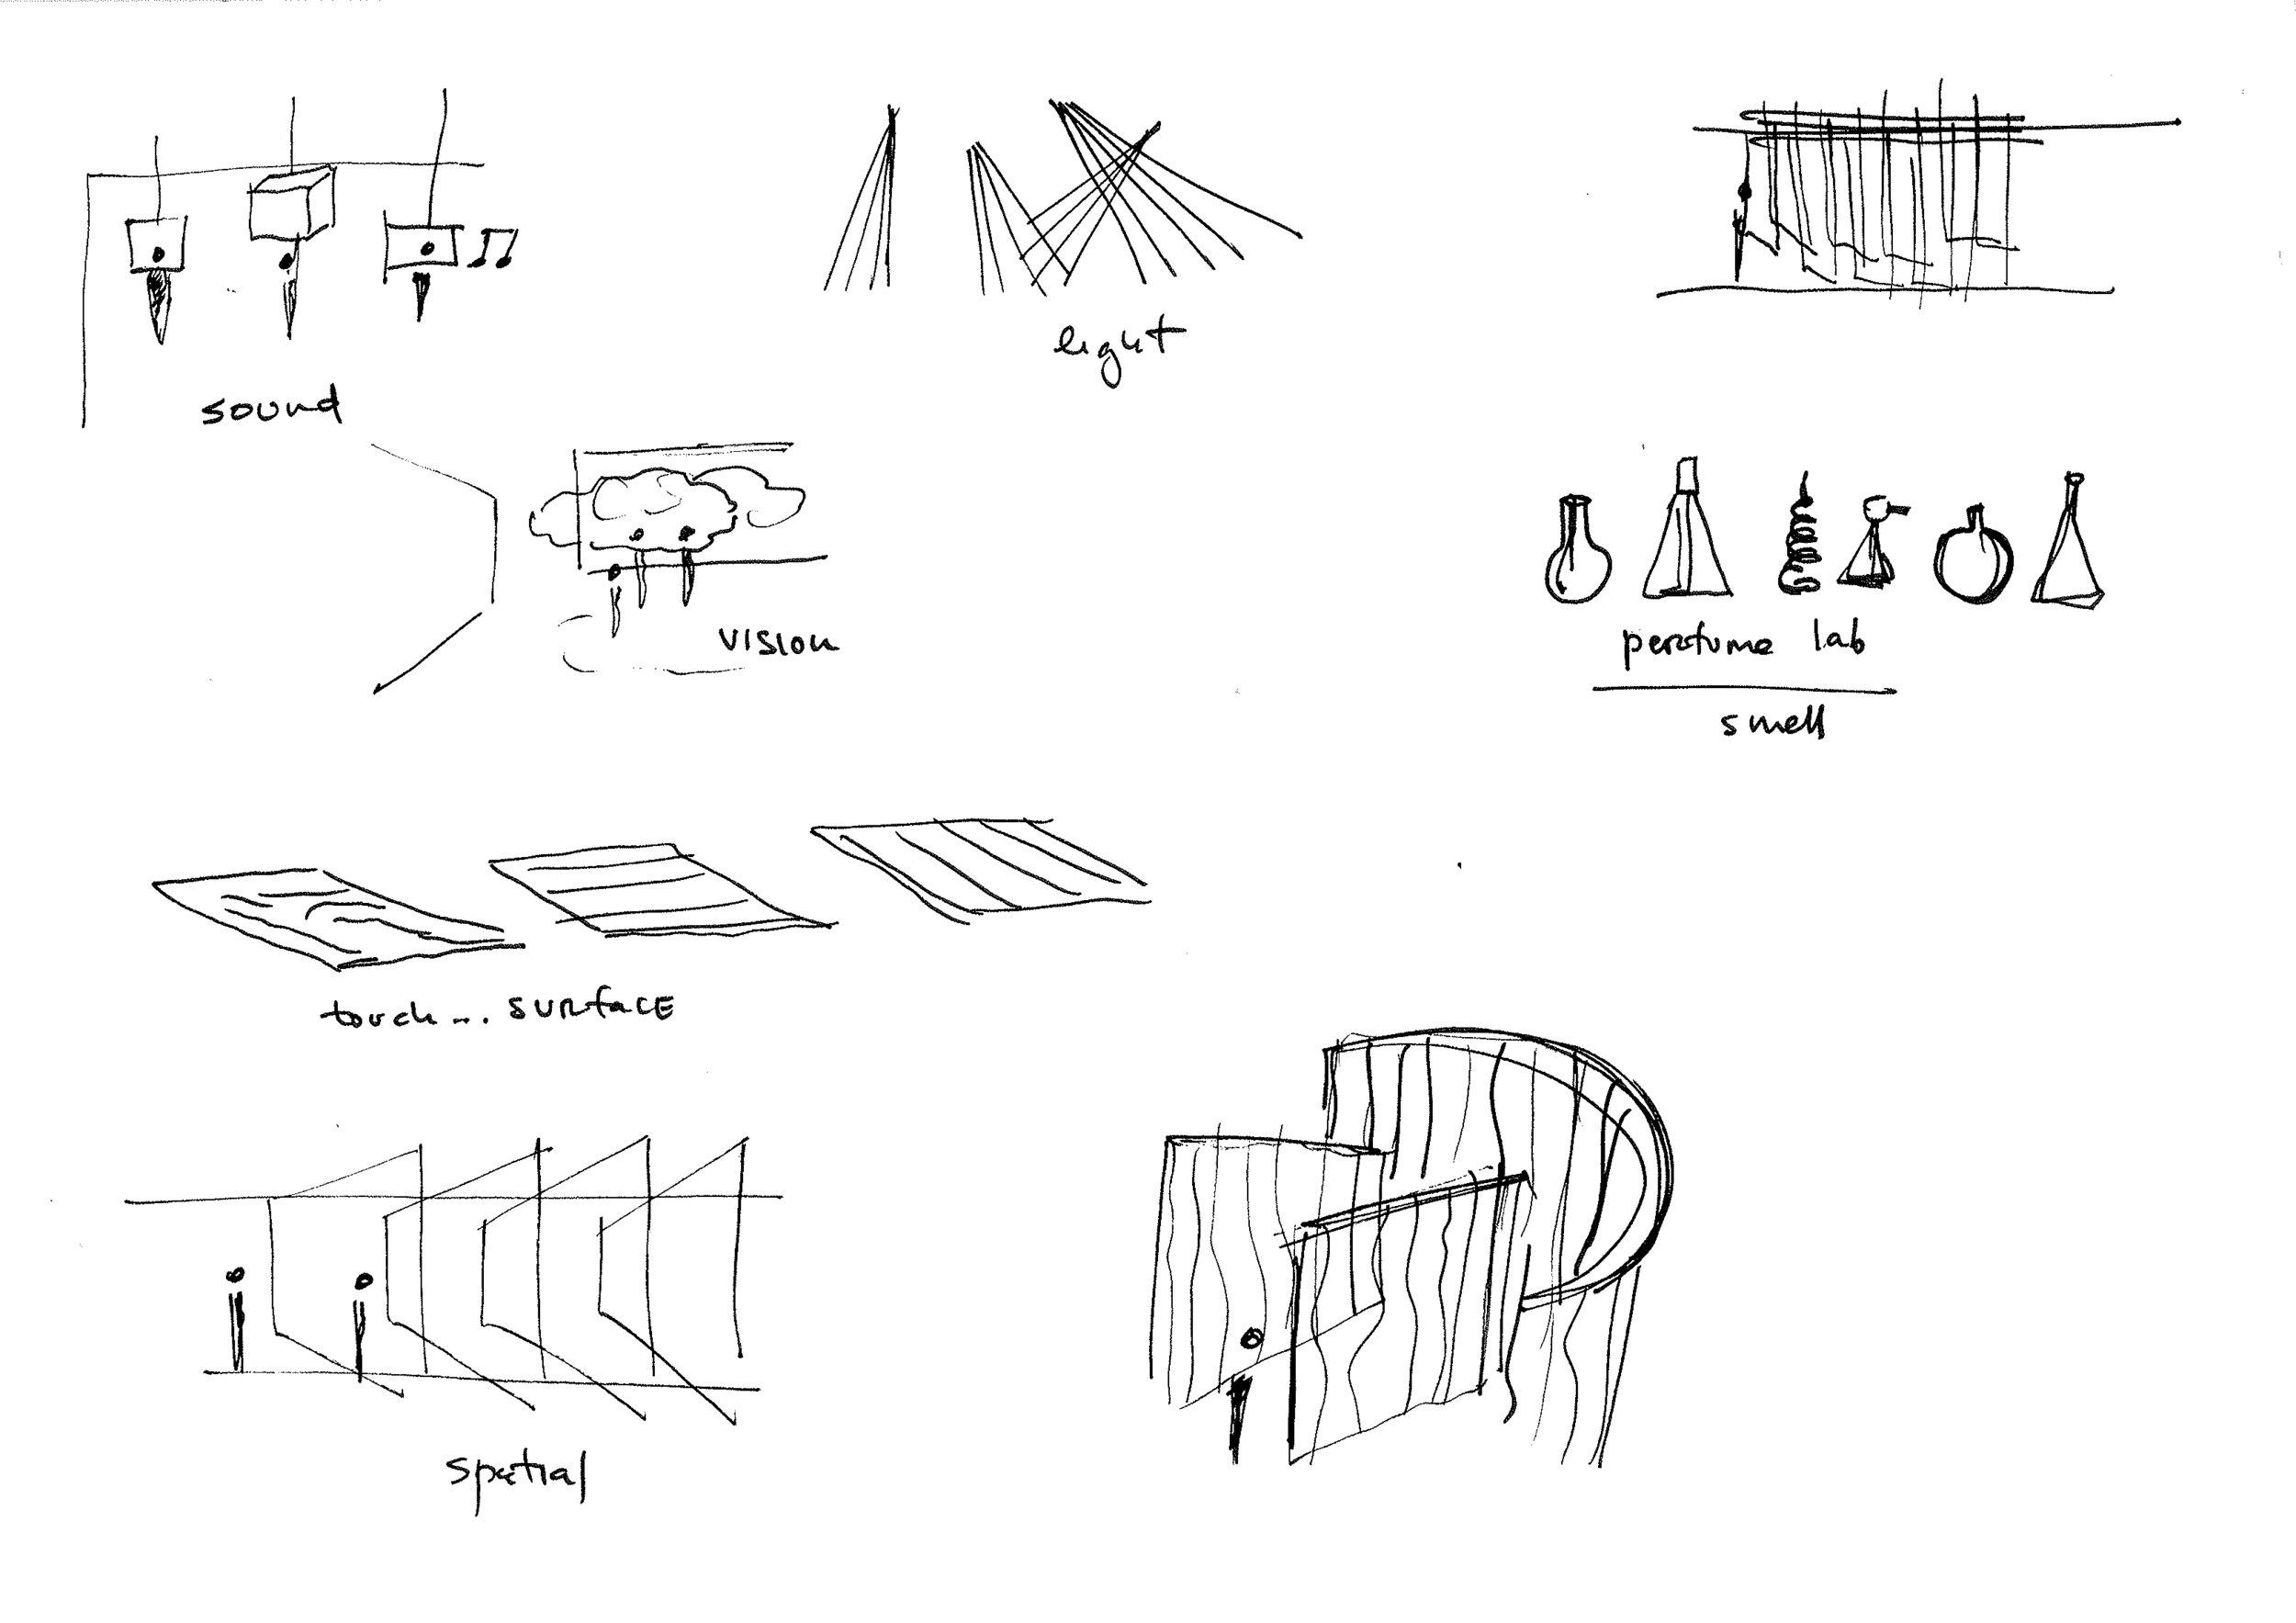 sensory_sketch.jpg